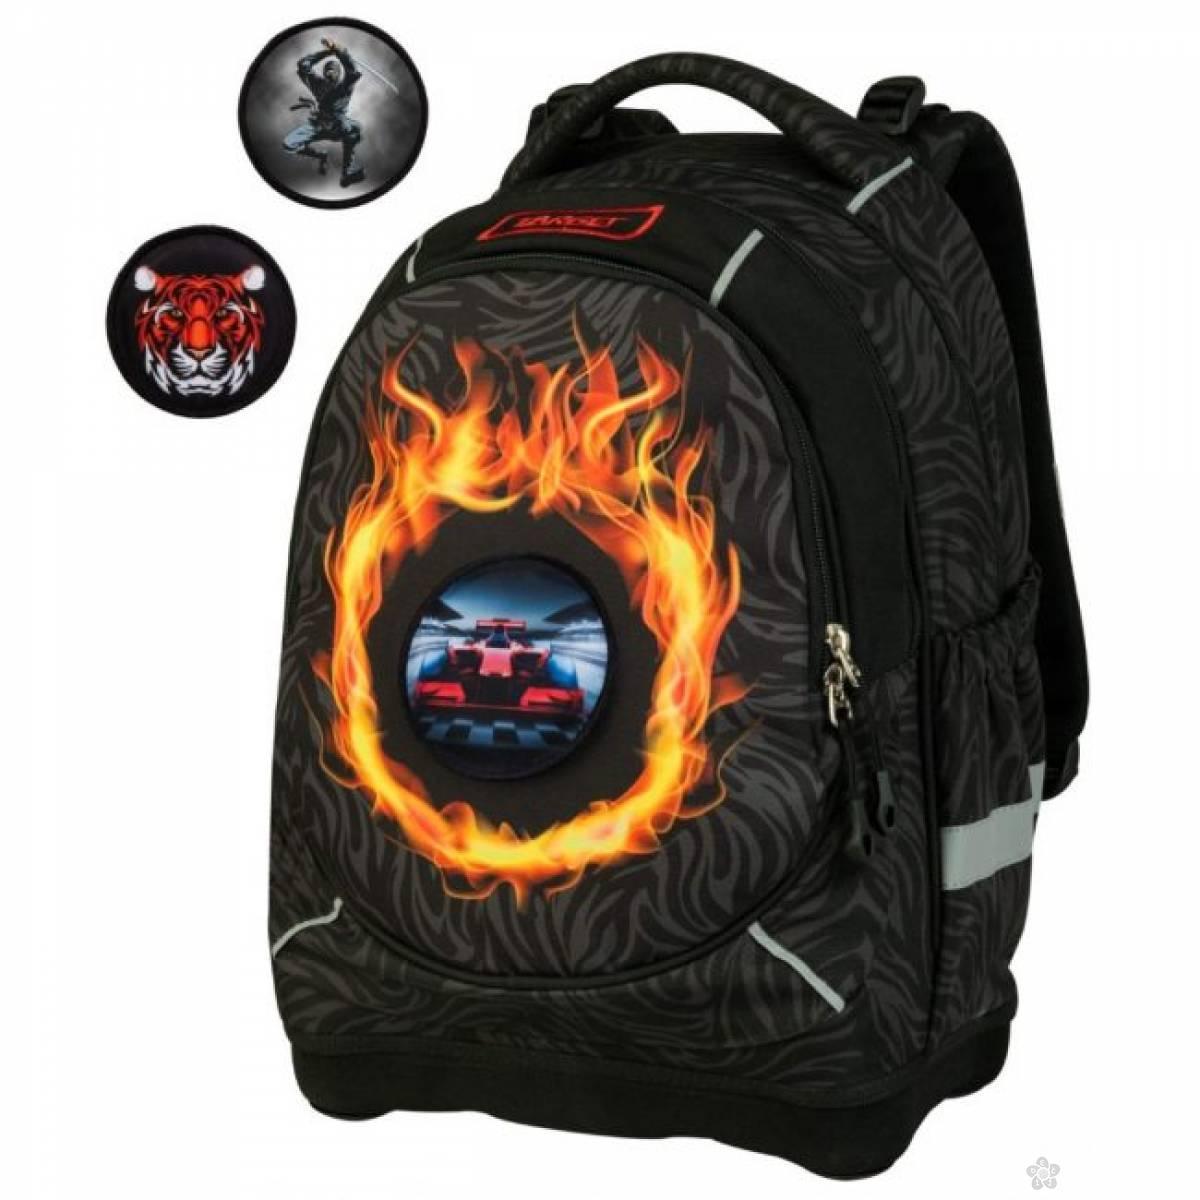 Antomski ranac Superlight Fire 26829